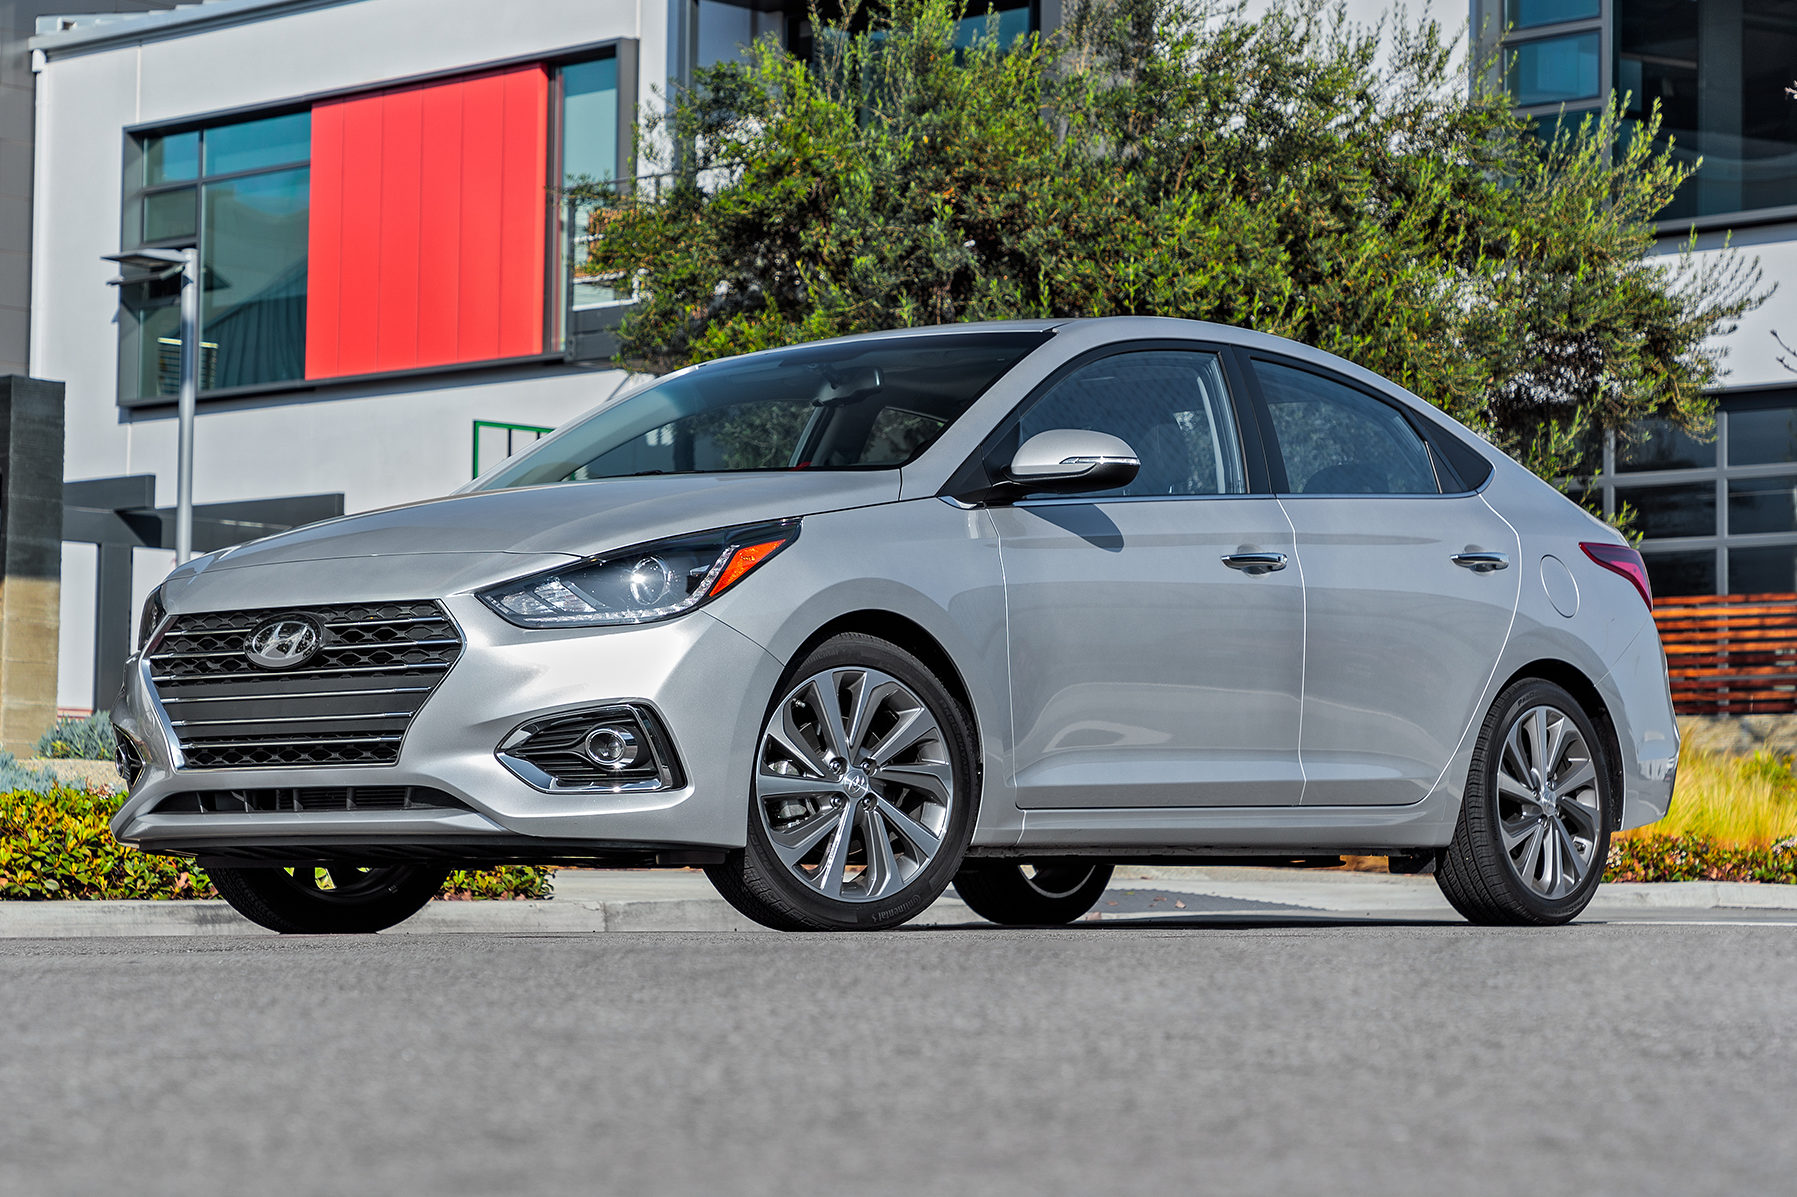 2018 Hyundai Accent Limited Front Three Quarter 01 E1519262472660